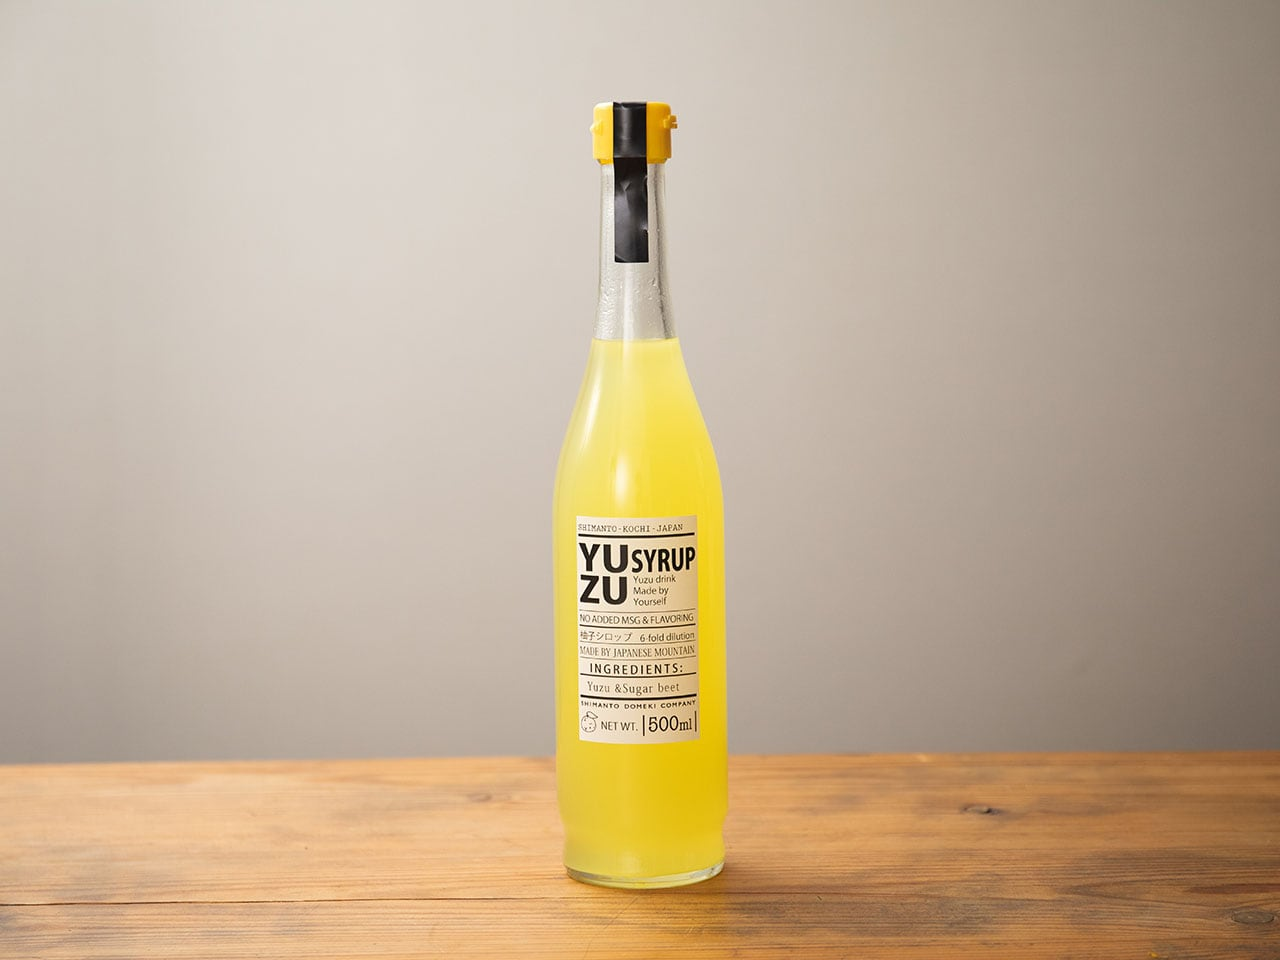 Concentrated Yuzu drink(濃縮柚子ドリンク) - SHIMANTO DOMEKI CO.,LTD